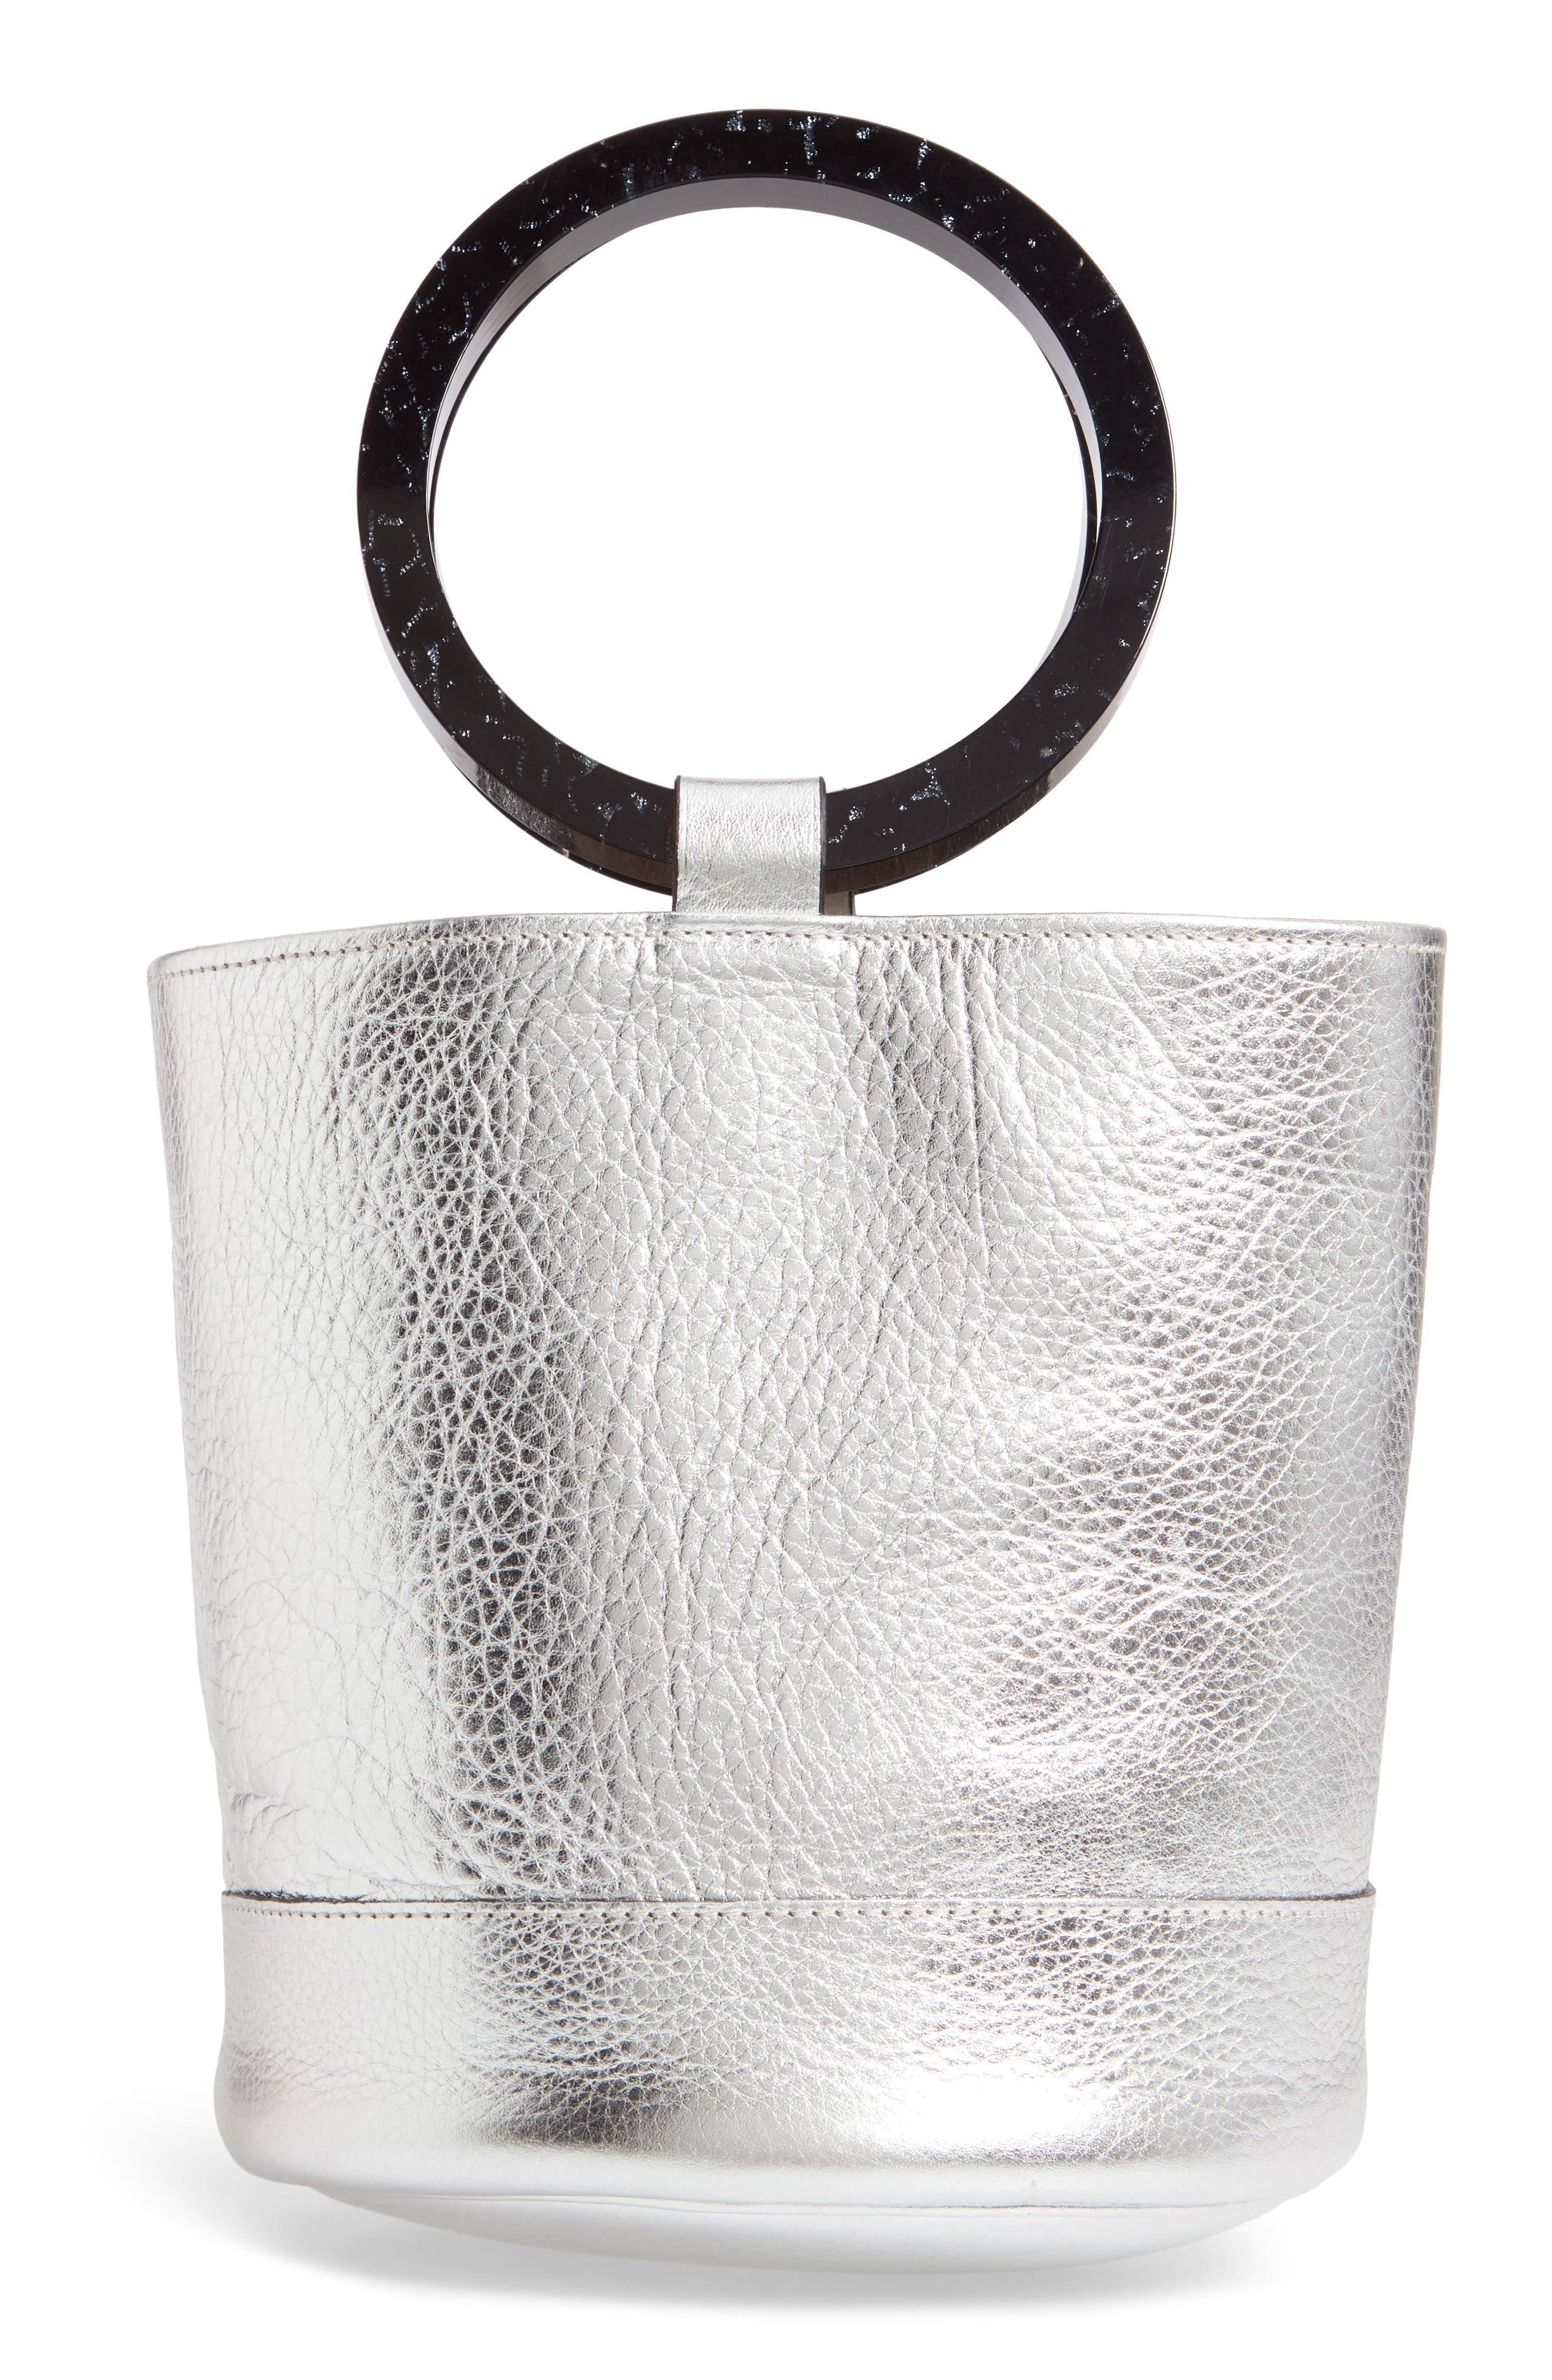 Bonsai 20 Pebbled Leather Bucket Bag,                             Alternate thumbnail 3, color,                             SILVER